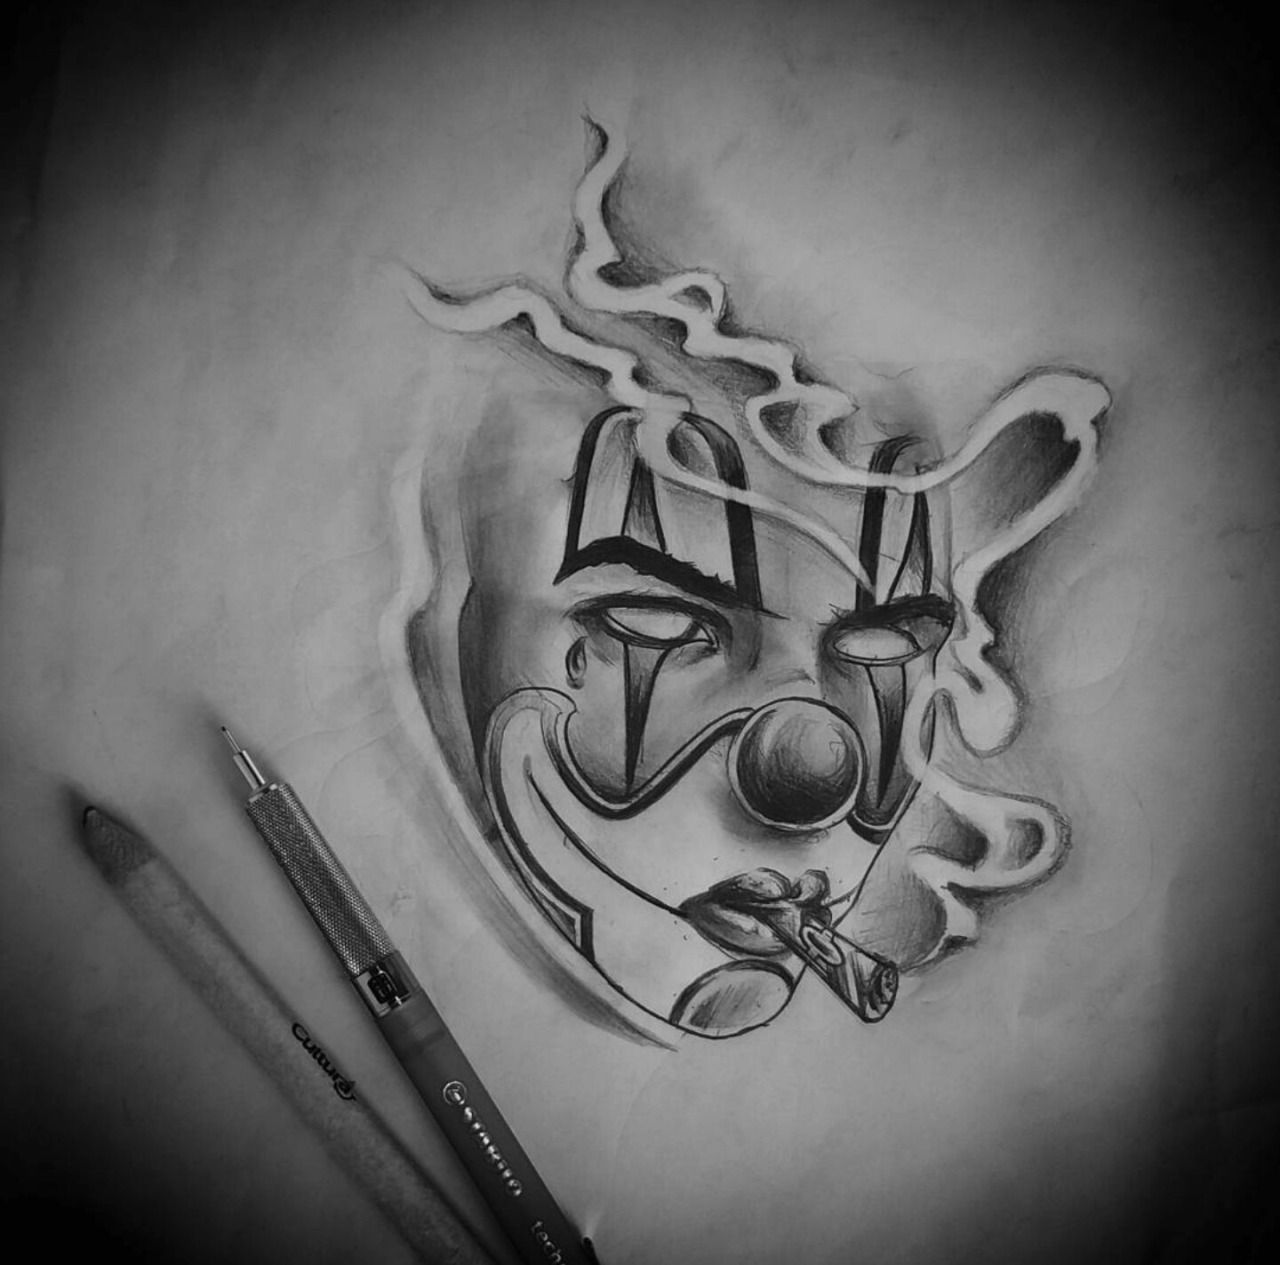 L A Chicano Cultura Chicano Art Tattoos Chicano Style Tattoo Tattoo Design Drawings